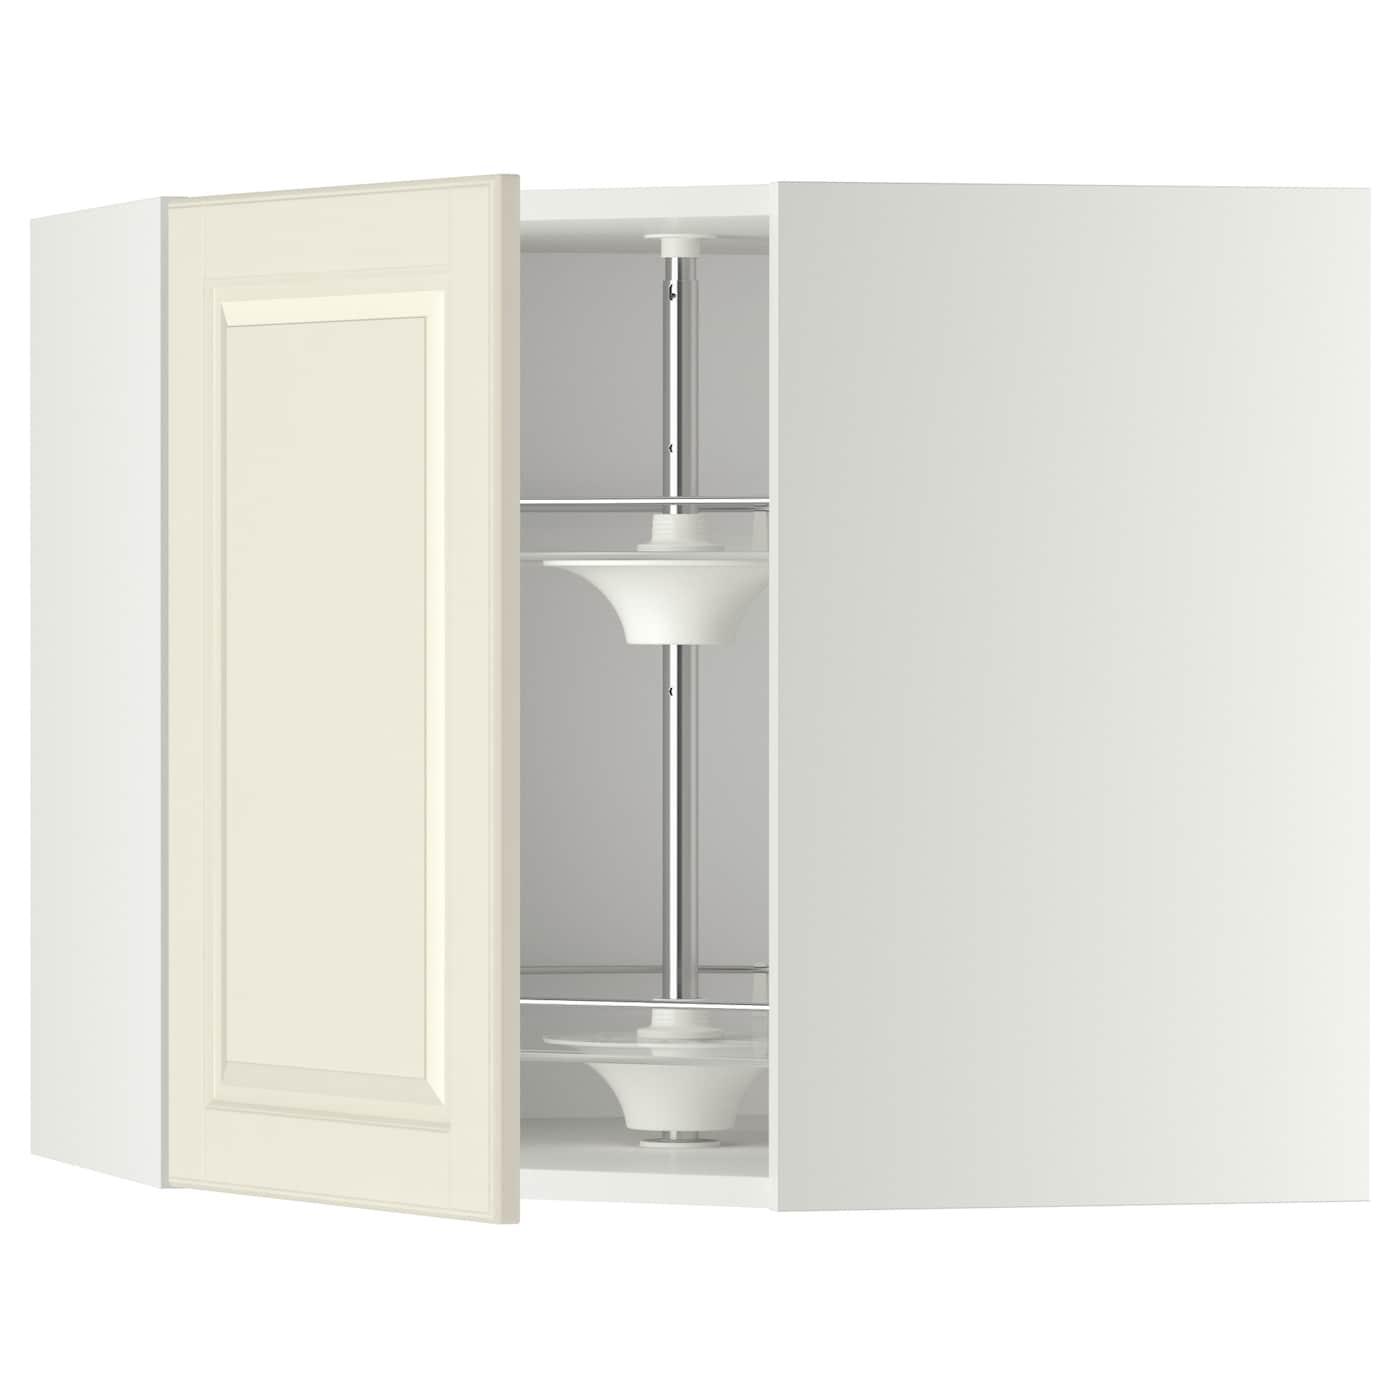 metod lt ang mur rgt pivot blanc bodbyn blanc cass 68x60 cm ikea. Black Bedroom Furniture Sets. Home Design Ideas